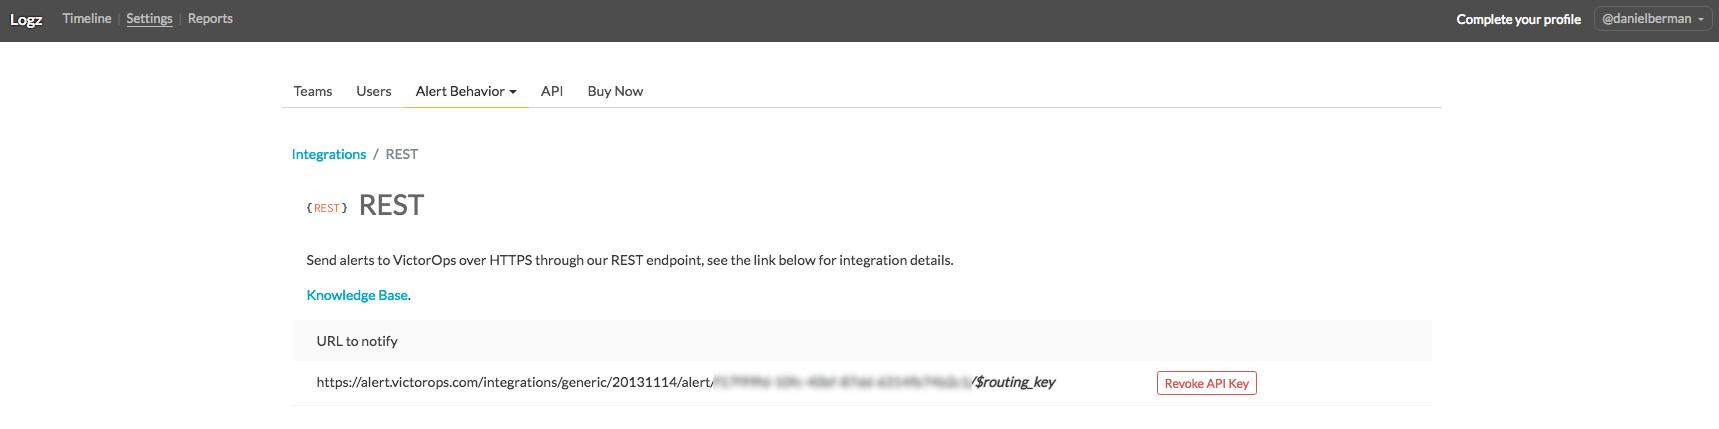 retrieve rest url with integration key